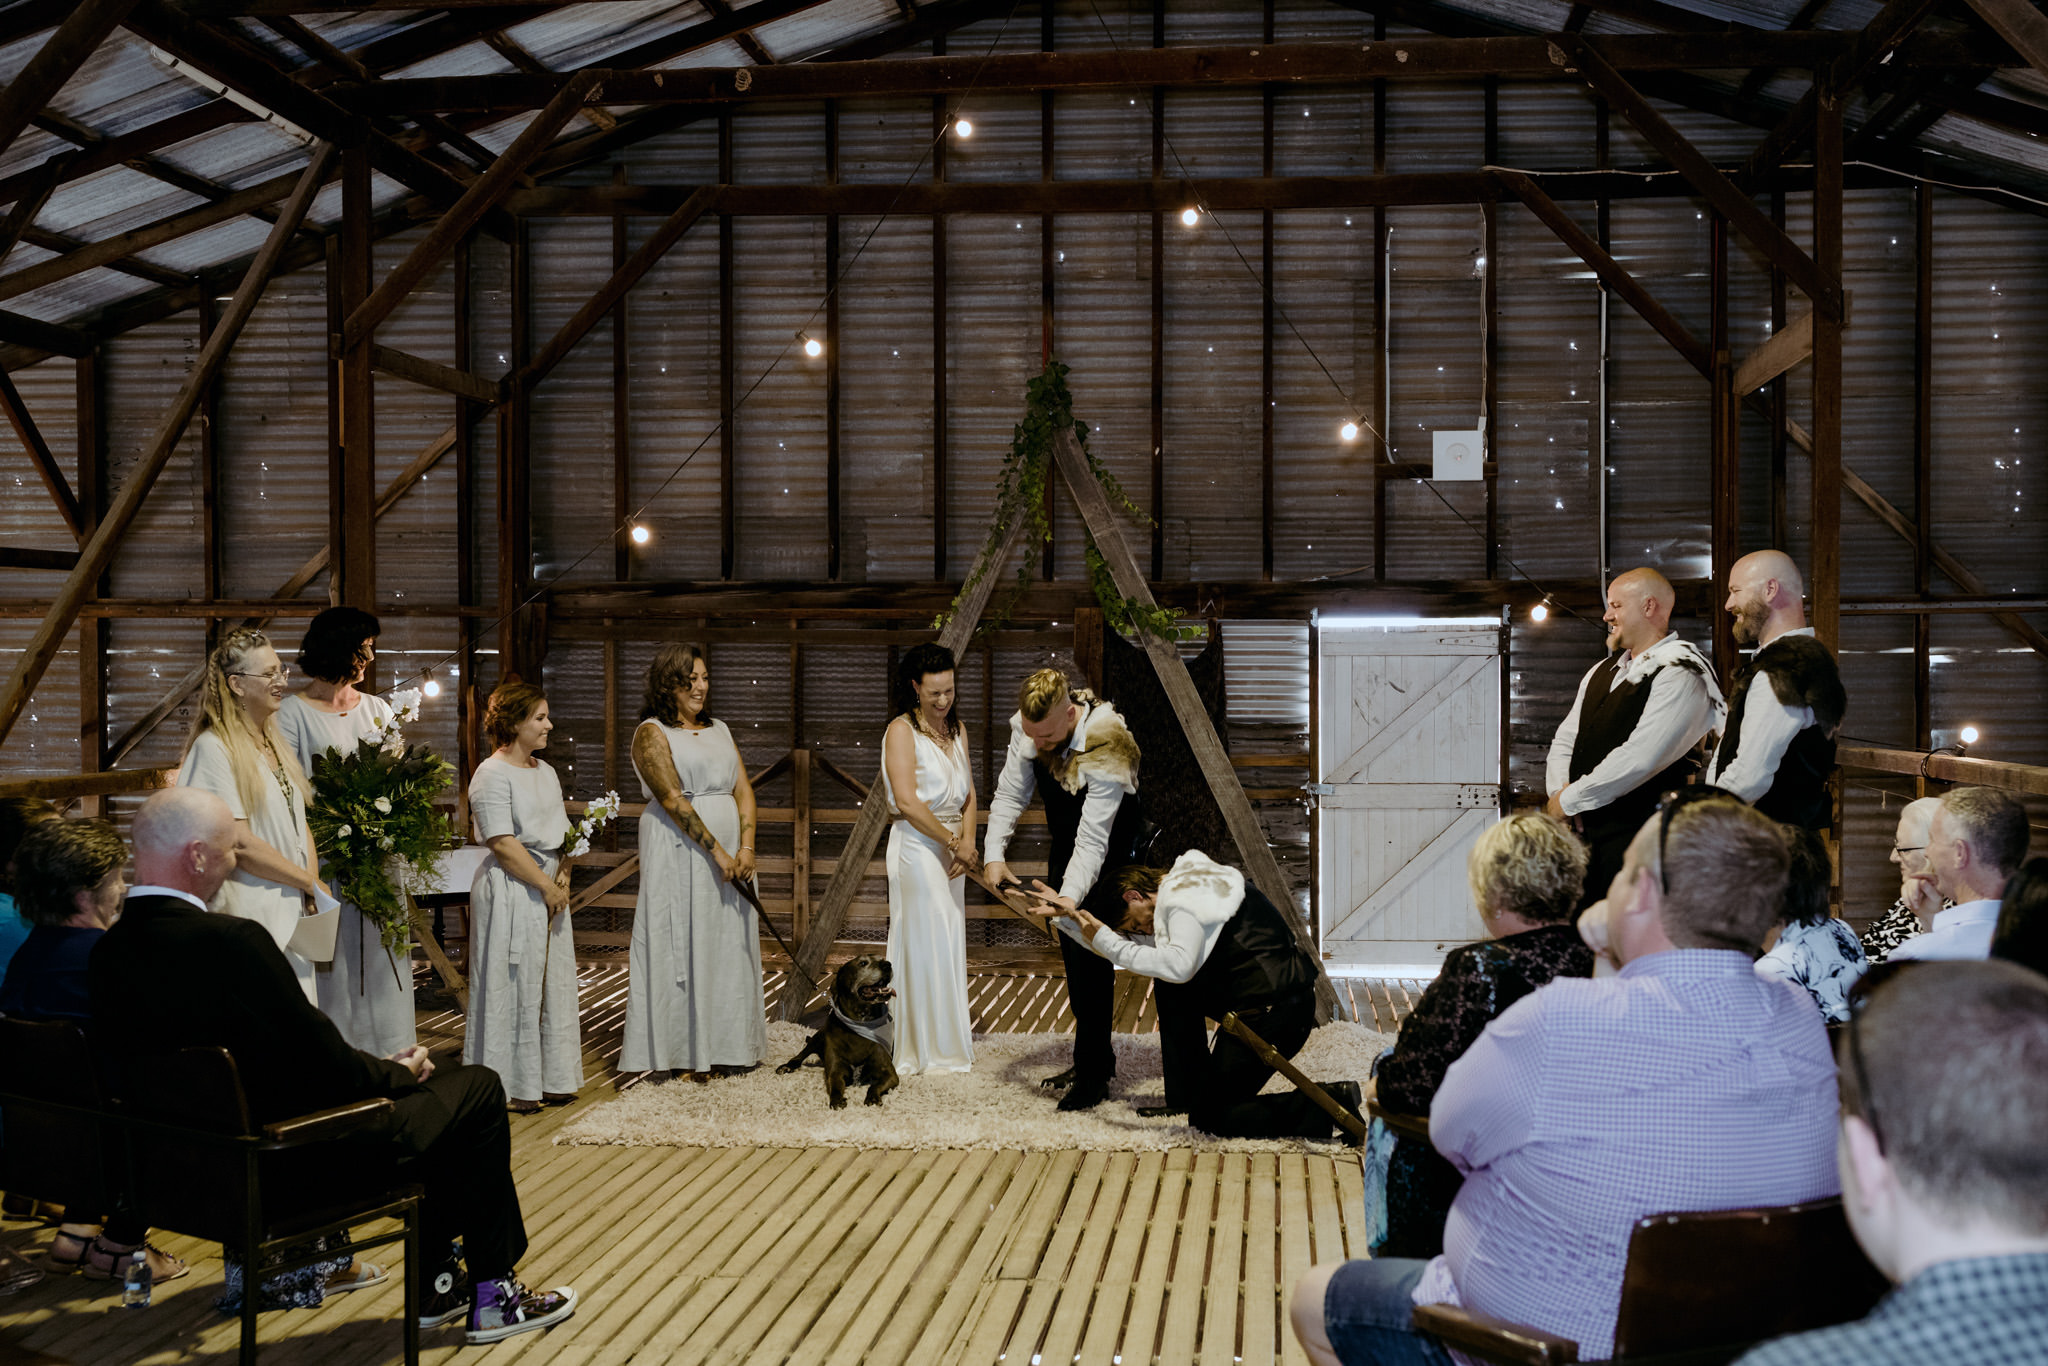 Yarralumla Woolshed Canberra Wedding Photographer Erin Latimore_109.JPG